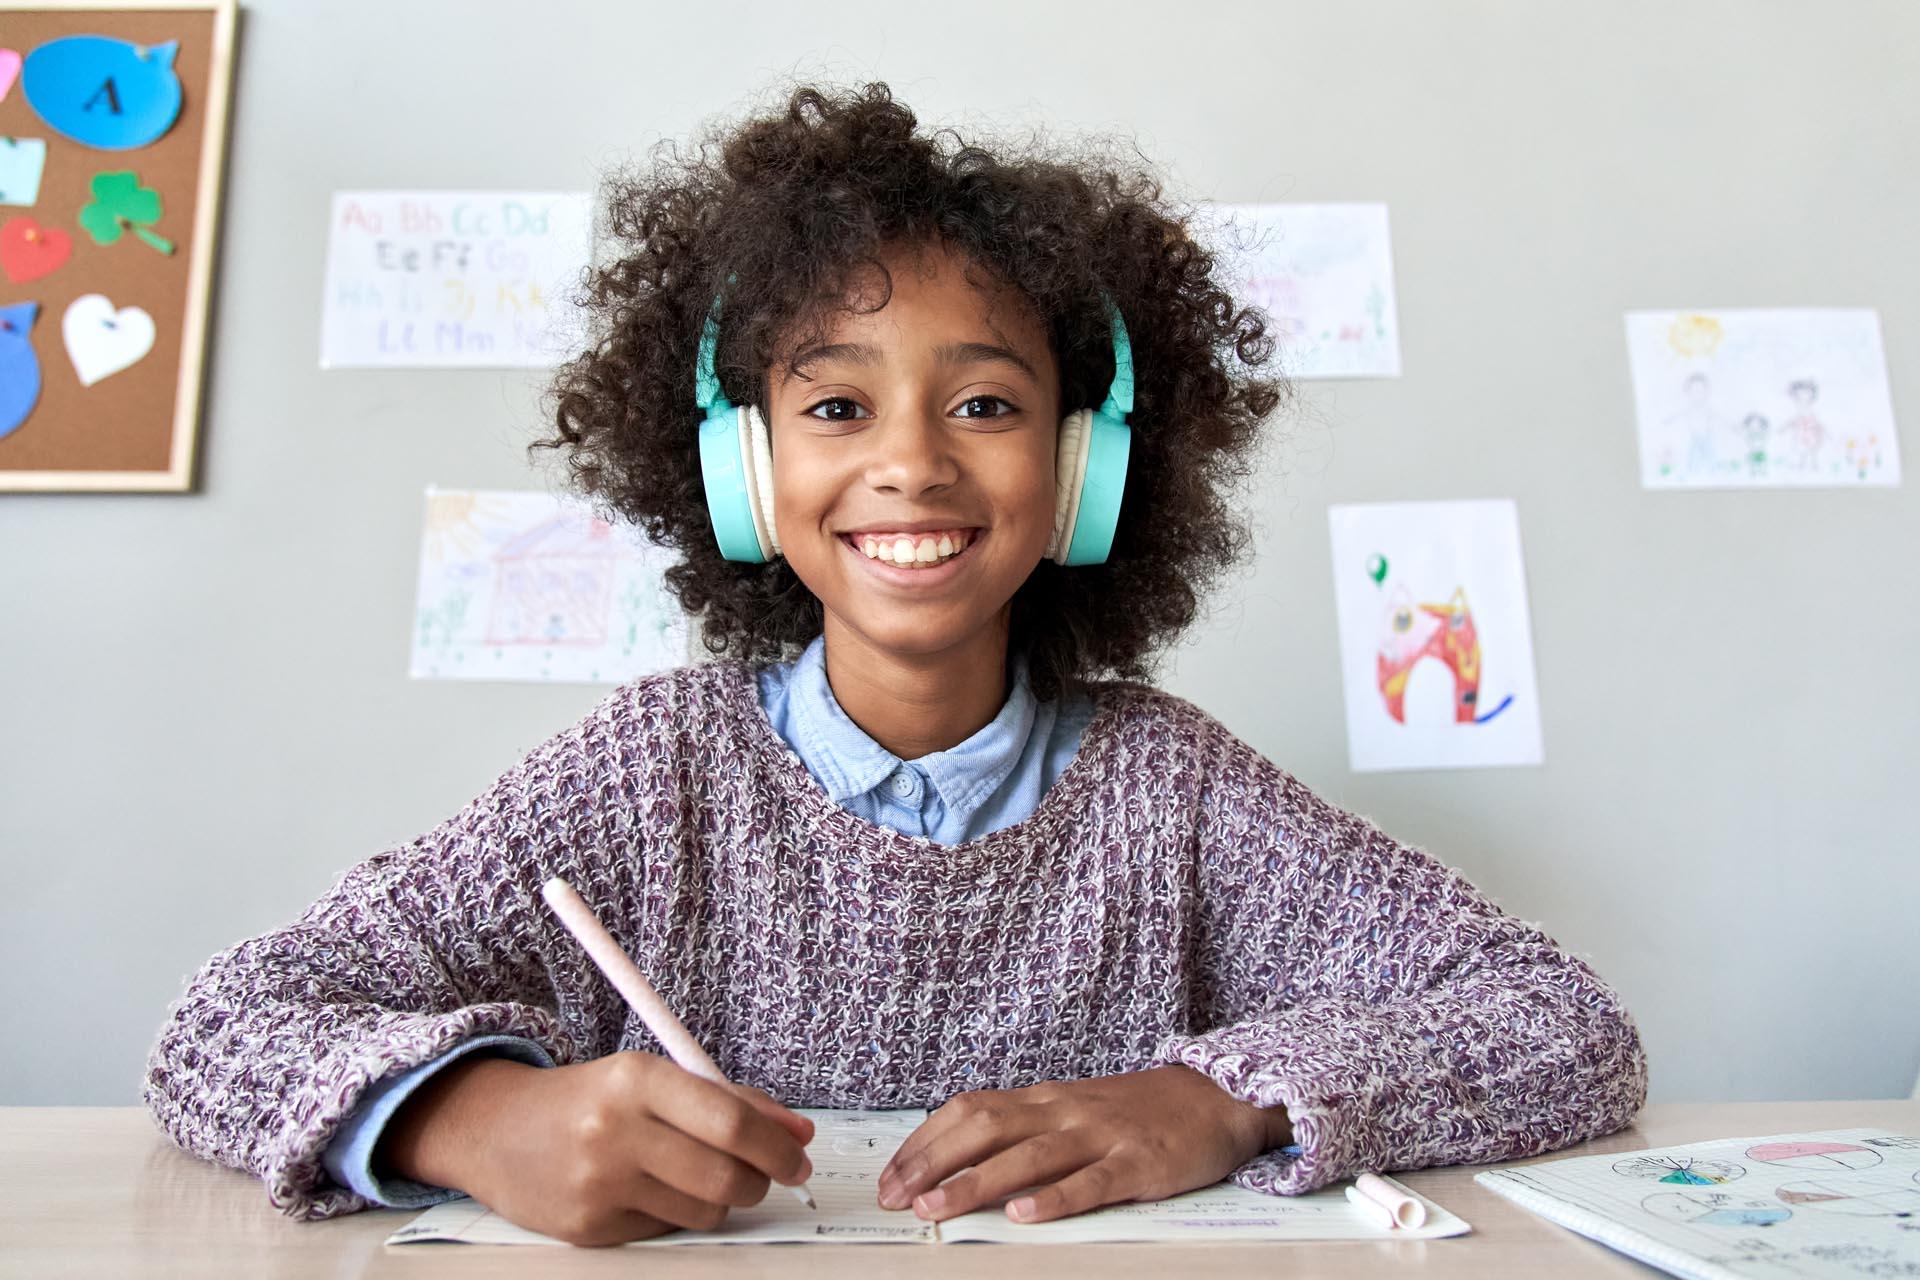 Happy,African,American,Kid,Child,Girl,Wearing,Headphones,Looking,At